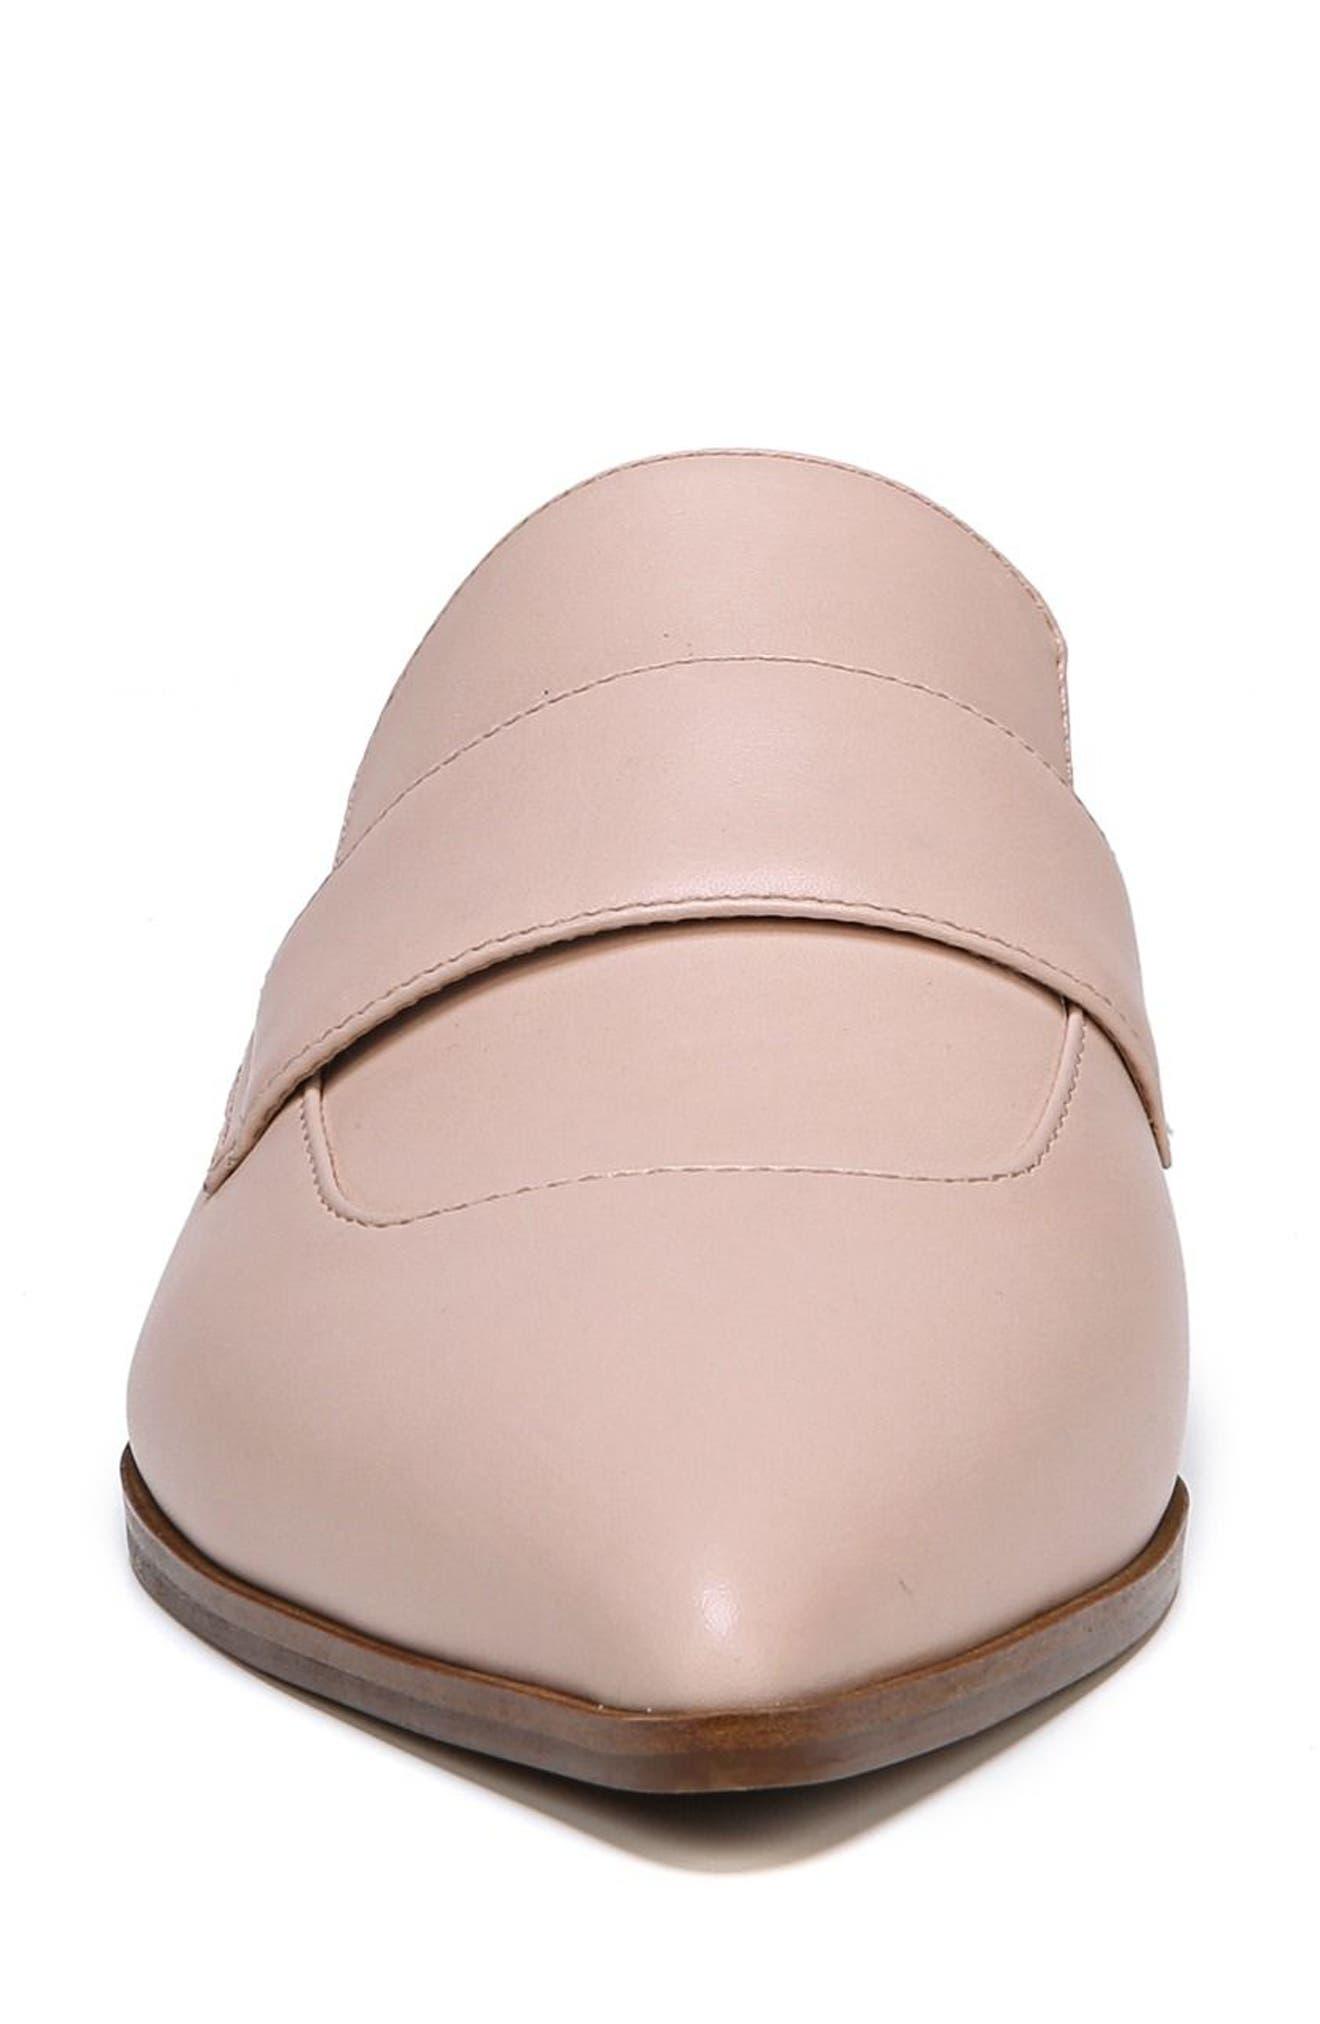 Palmer Mule,                             Alternate thumbnail 4, color,                             Blush Leather